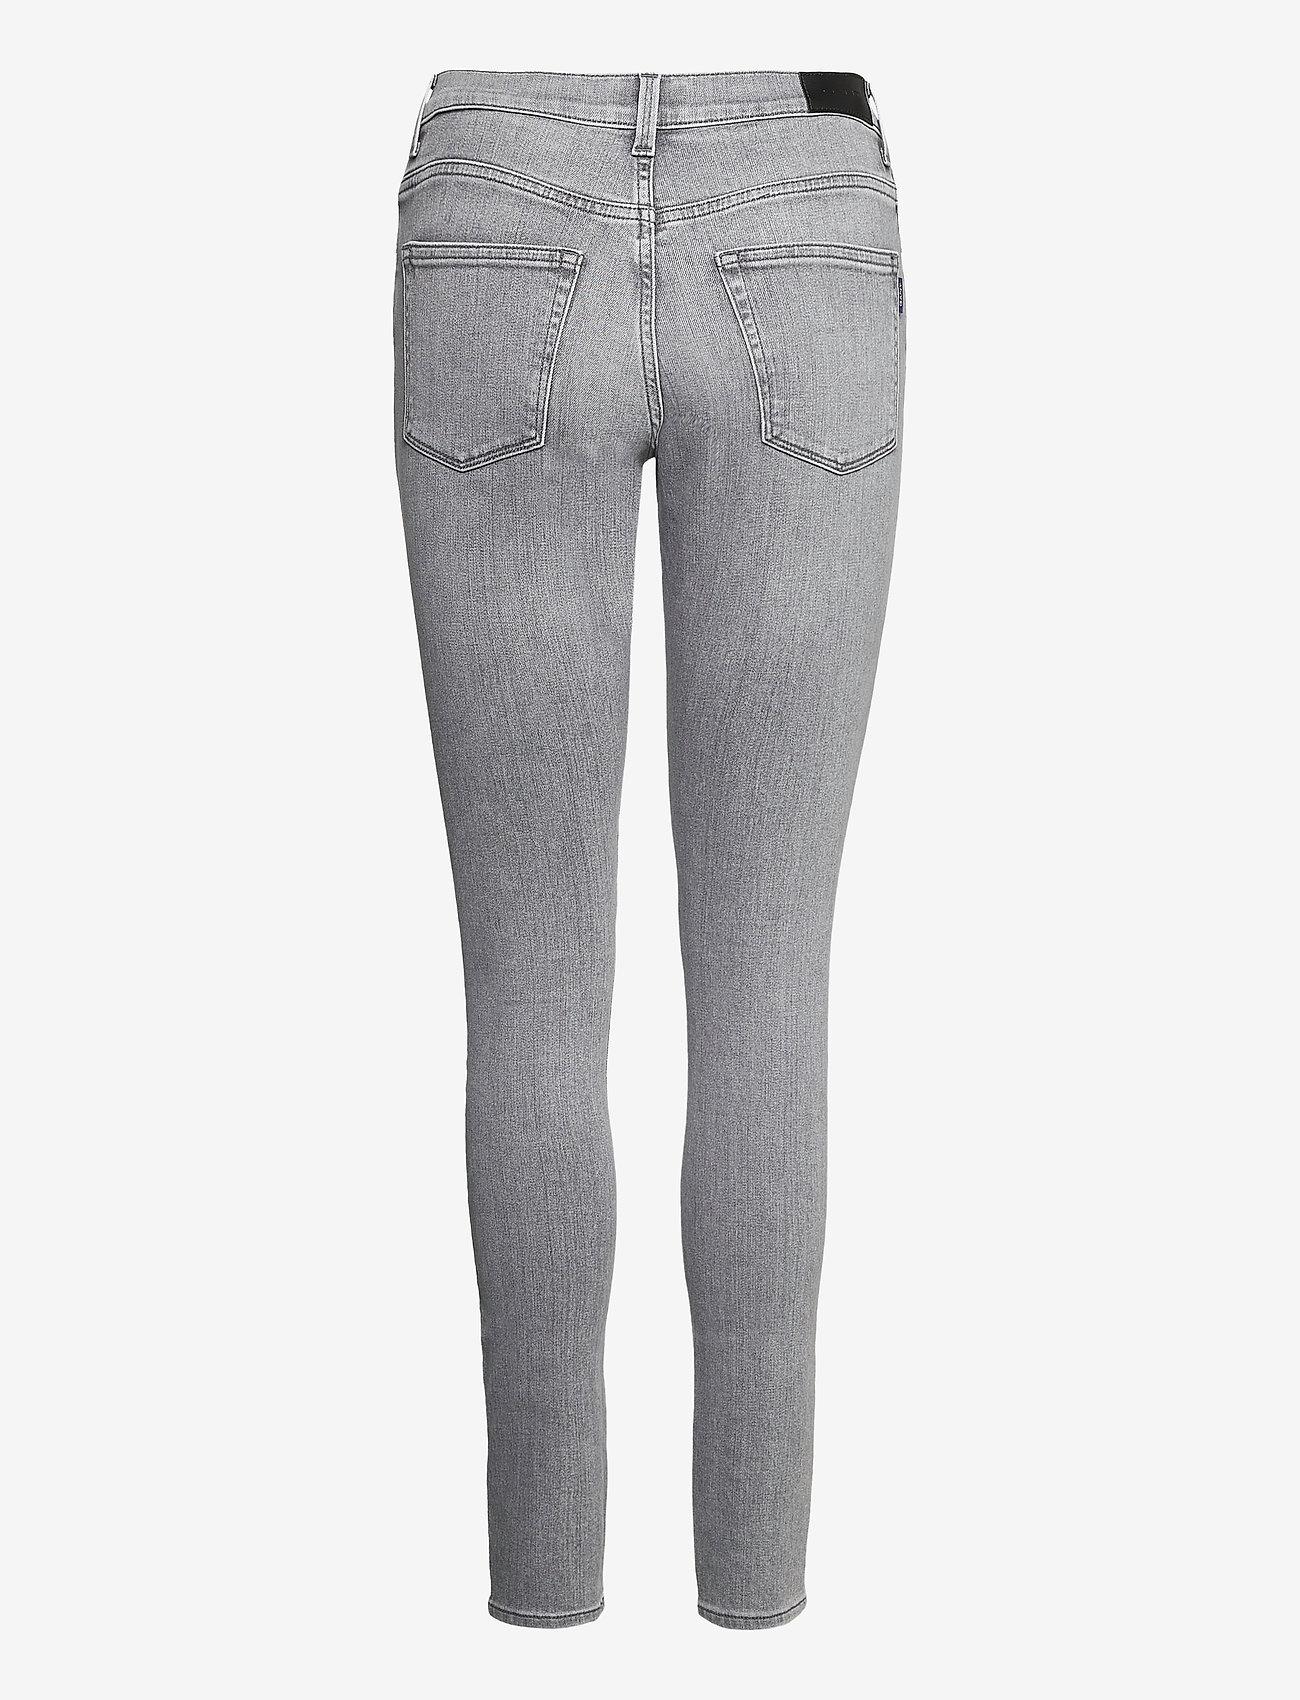 GANT - SKINNY SUPER STRETCH JEANS - skinny jeans - grey worn in - 1